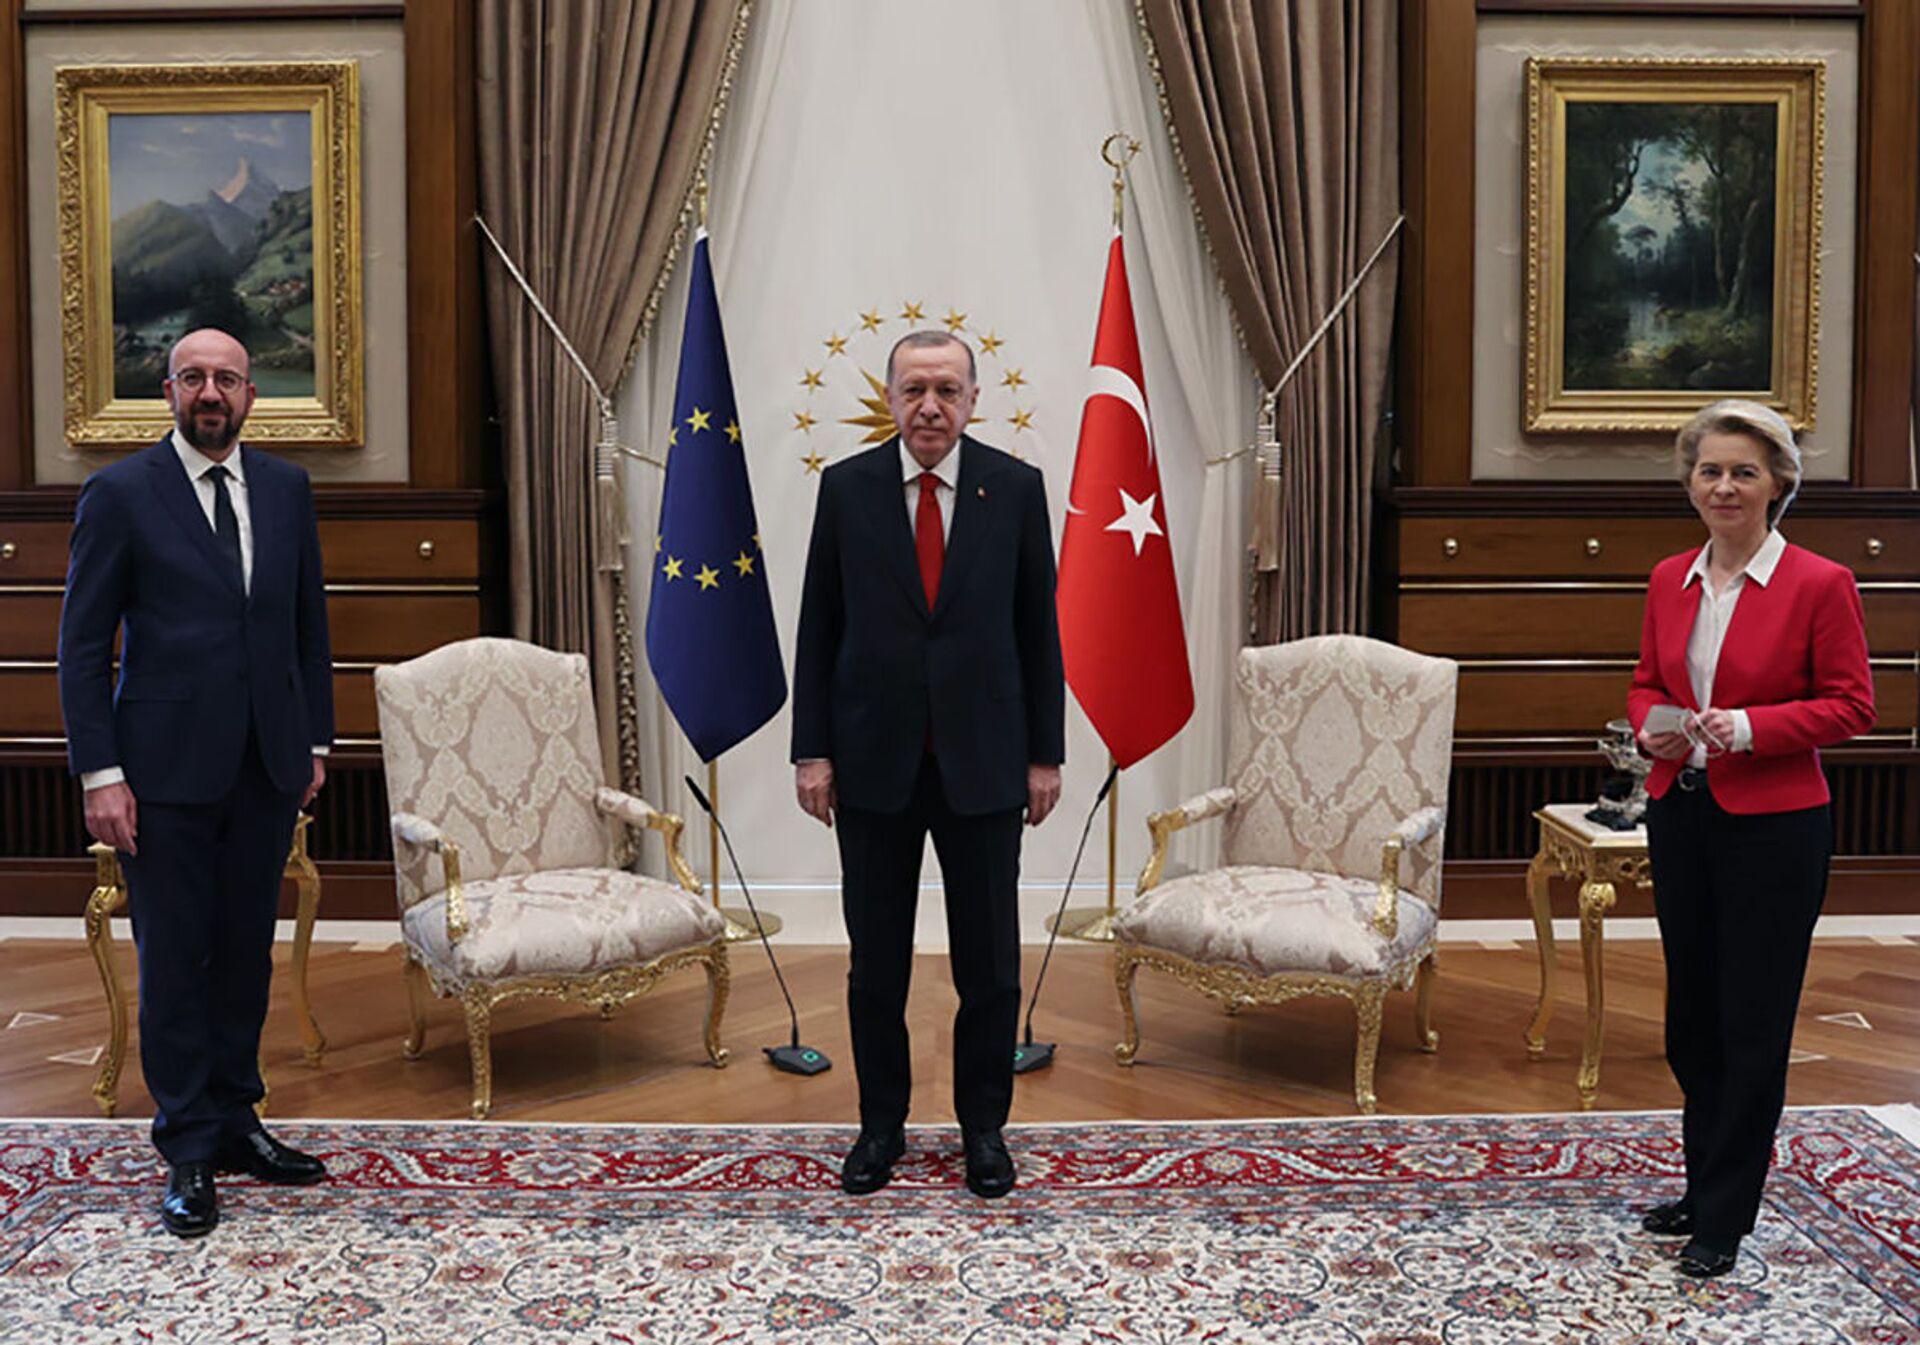 L'incontro tra Recep Tayyip Erdogan, Charles Michel e Ursula Von der Leyen - Sputnik Italia, 1920, 18.05.2021